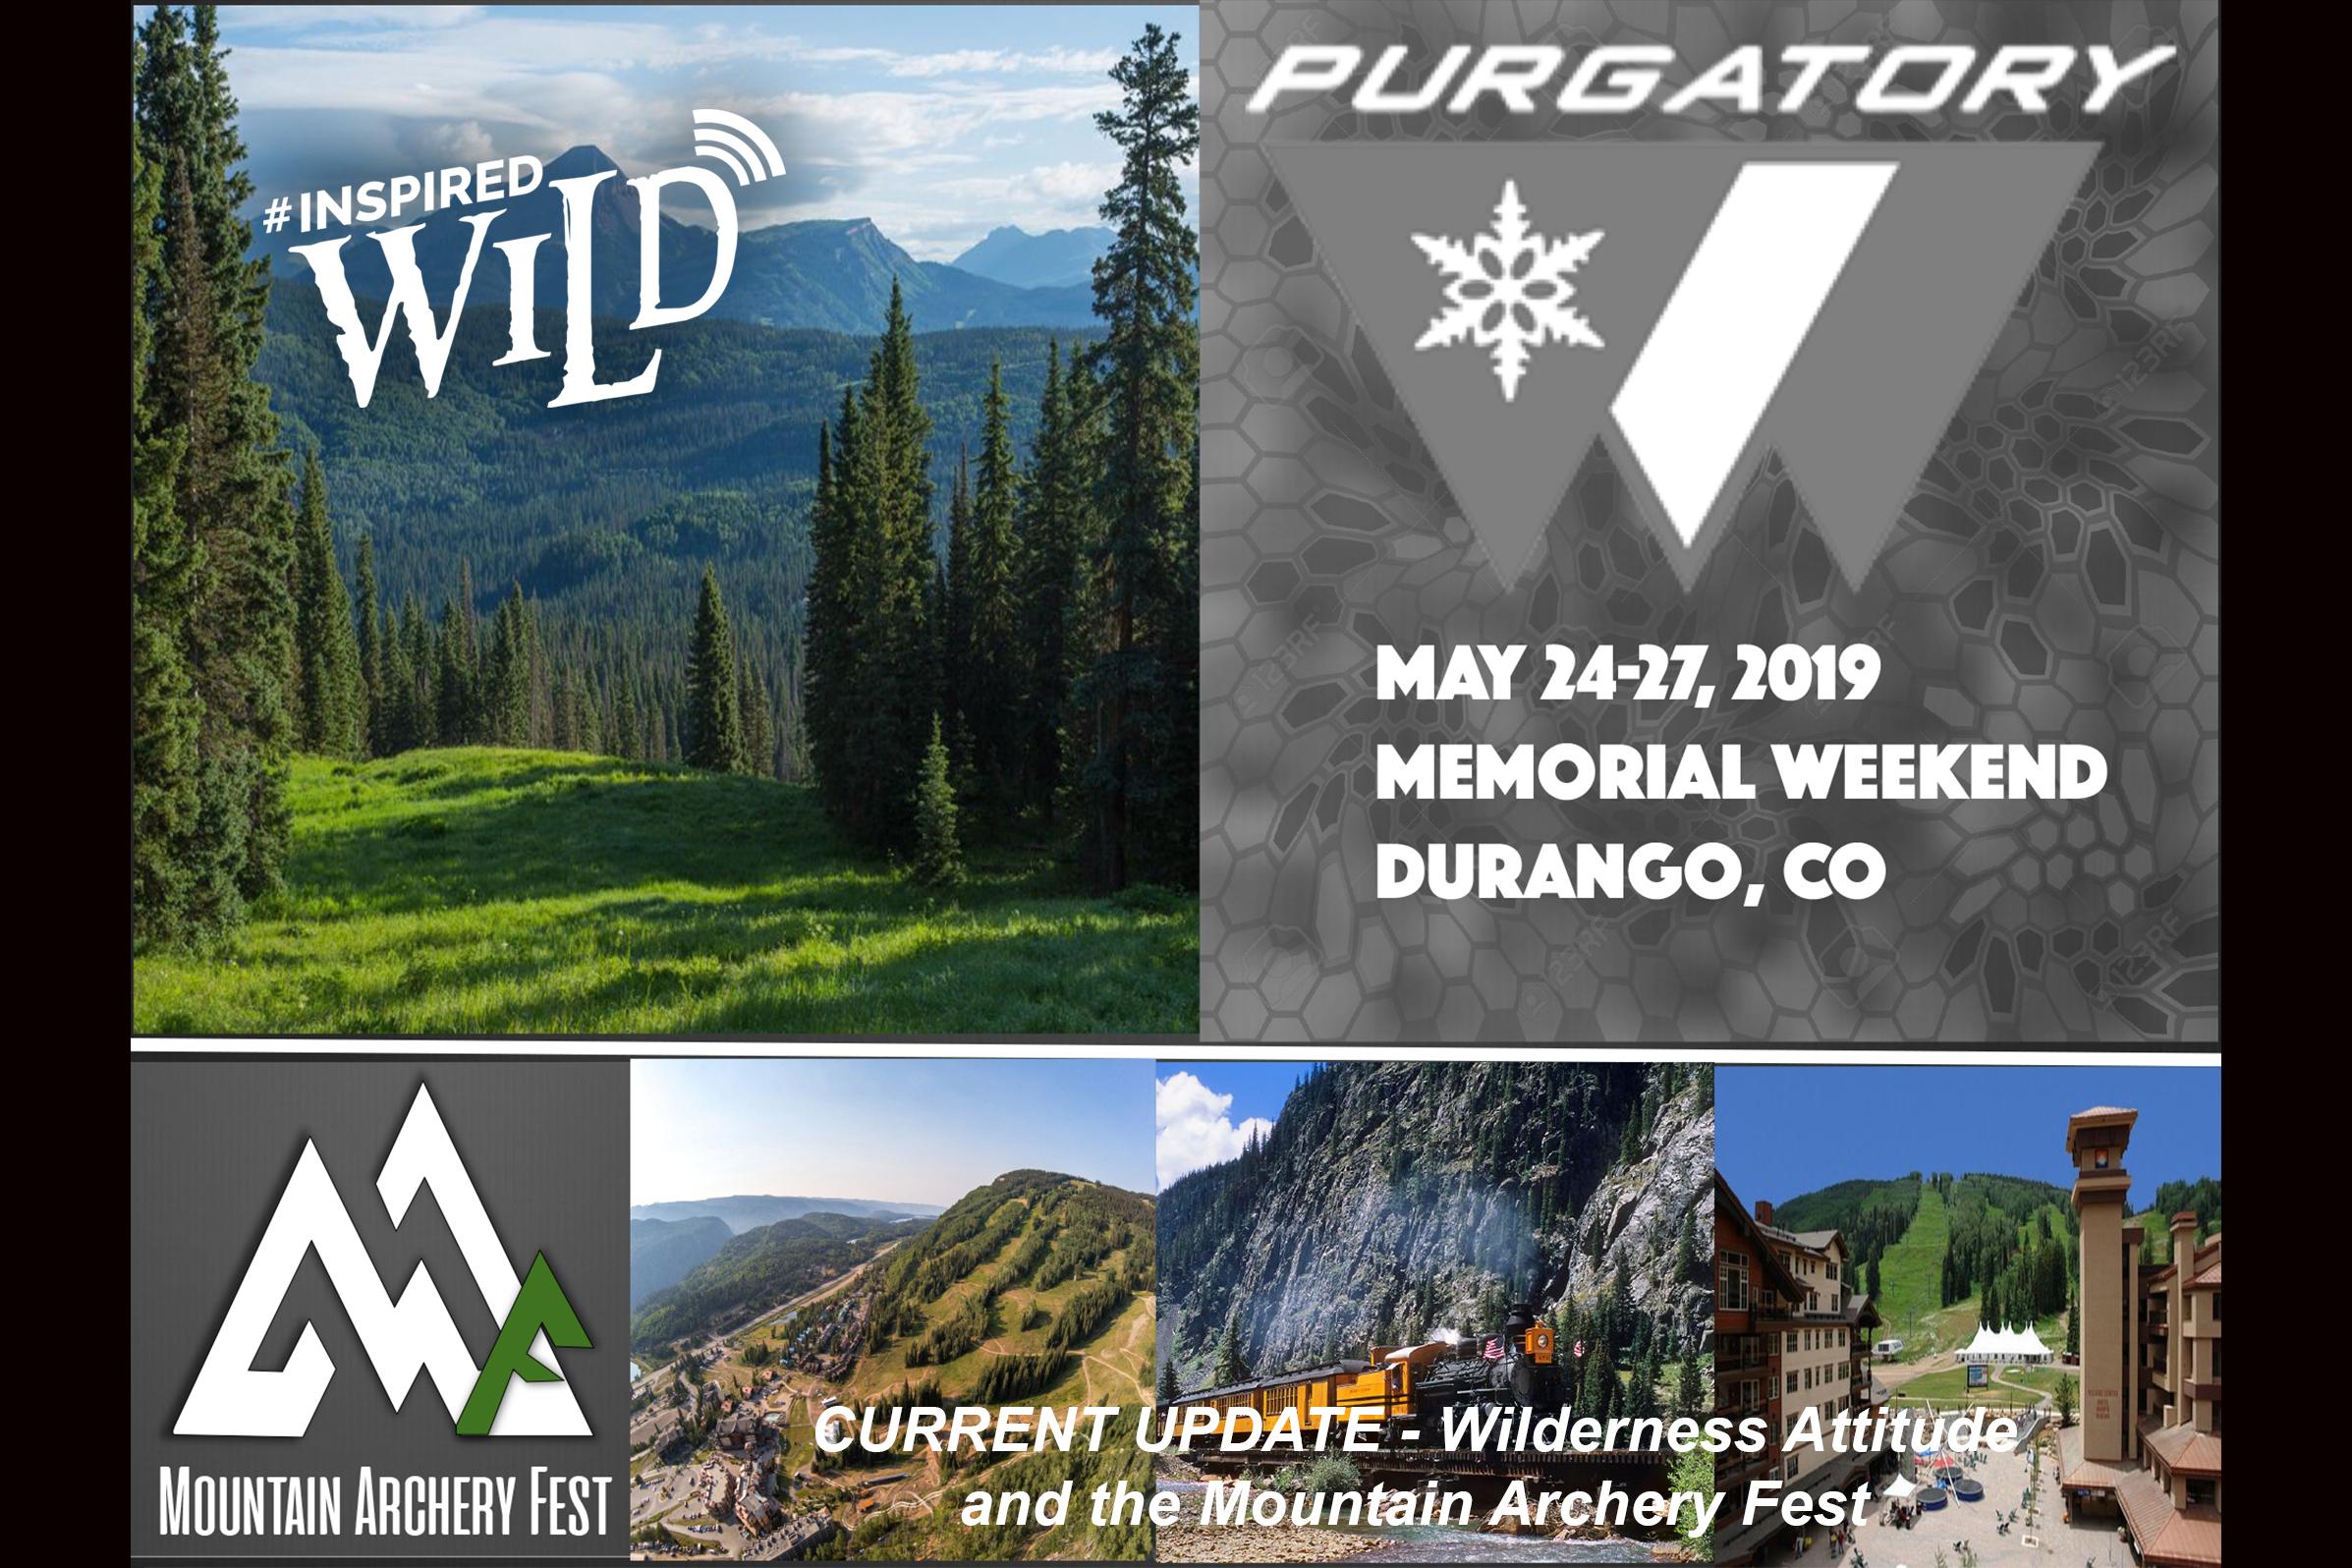 EP 25B_WildernessAttitude&Mountain Archery Fest.jpg